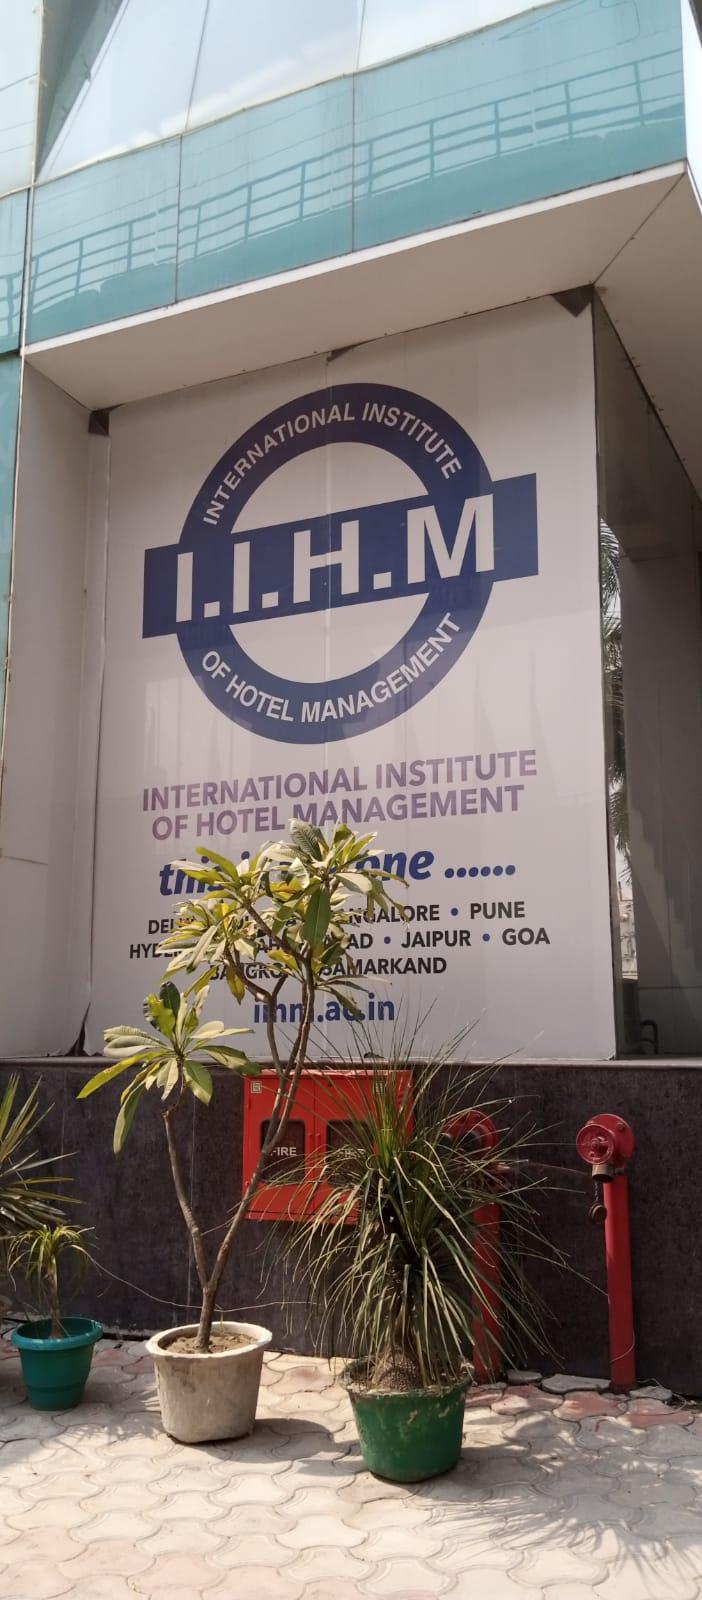 I.I.H.M (International Institute of Hotel Management) Logo